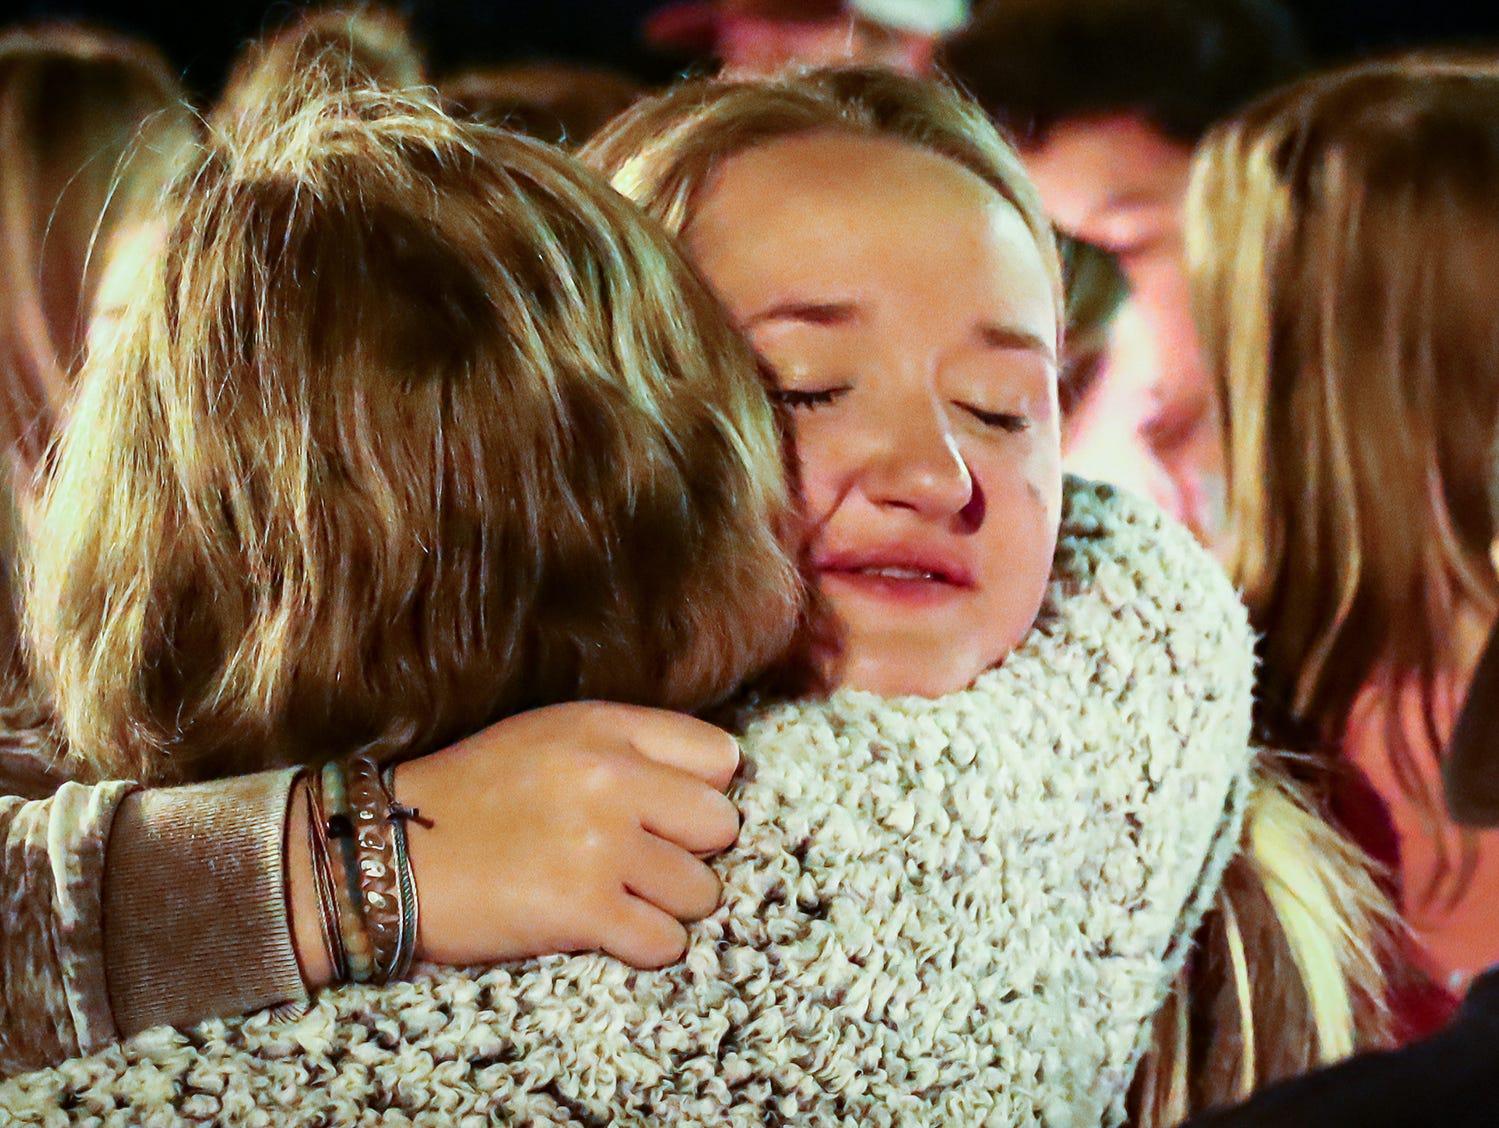 Olivia Walker, daughter of tornado victim Angie Walker, takes comfort in a hug during  a vigil at Eagleville School. Walker, 41, was killed in and EF-2 tornado in Christiana, Tenn., on Tuesday, Nov. 6, 2018.